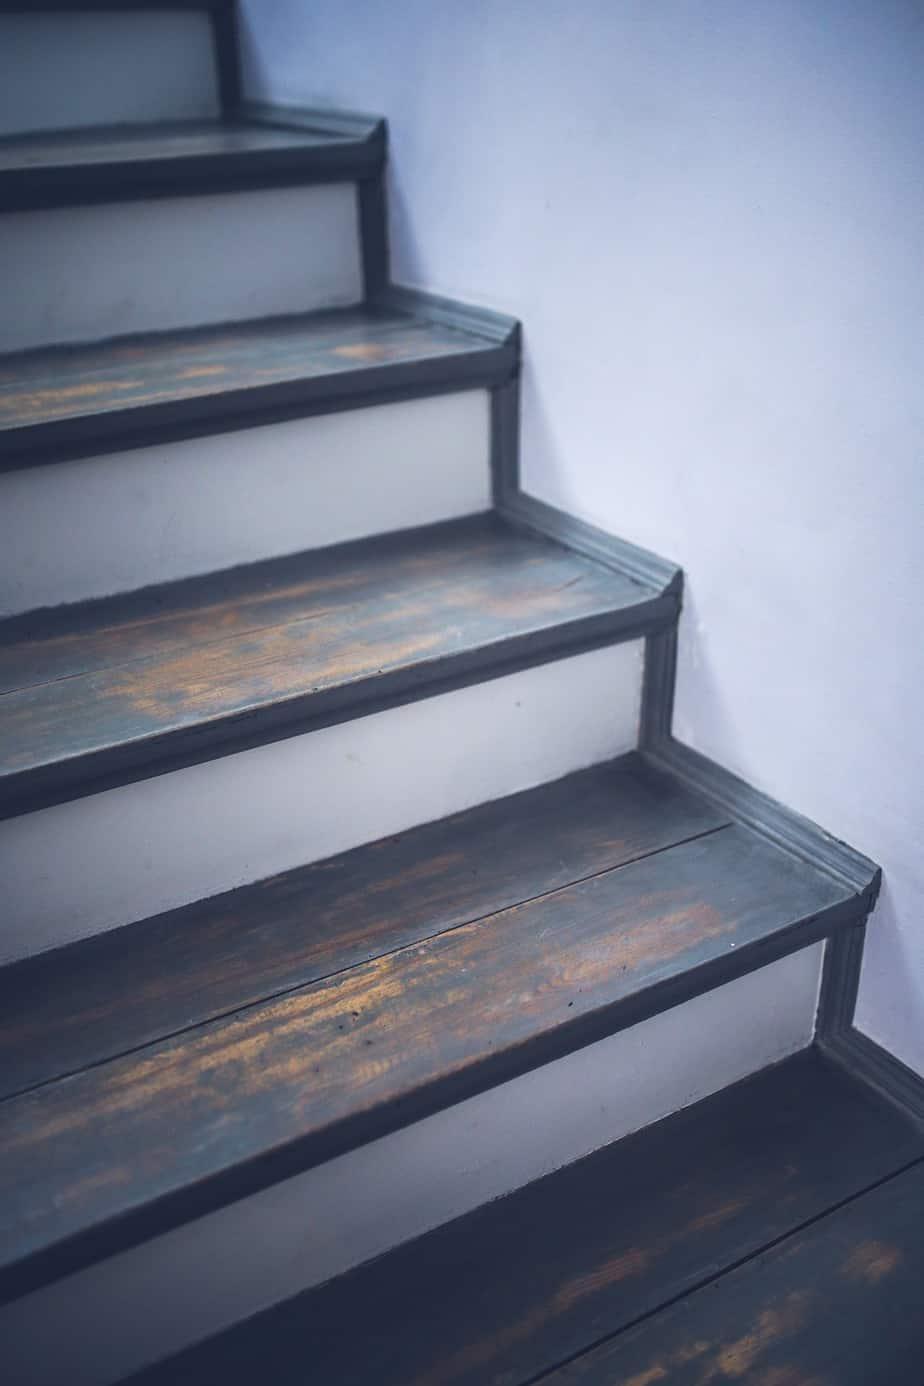 Vinyl Flooring Be Installed On Stairs